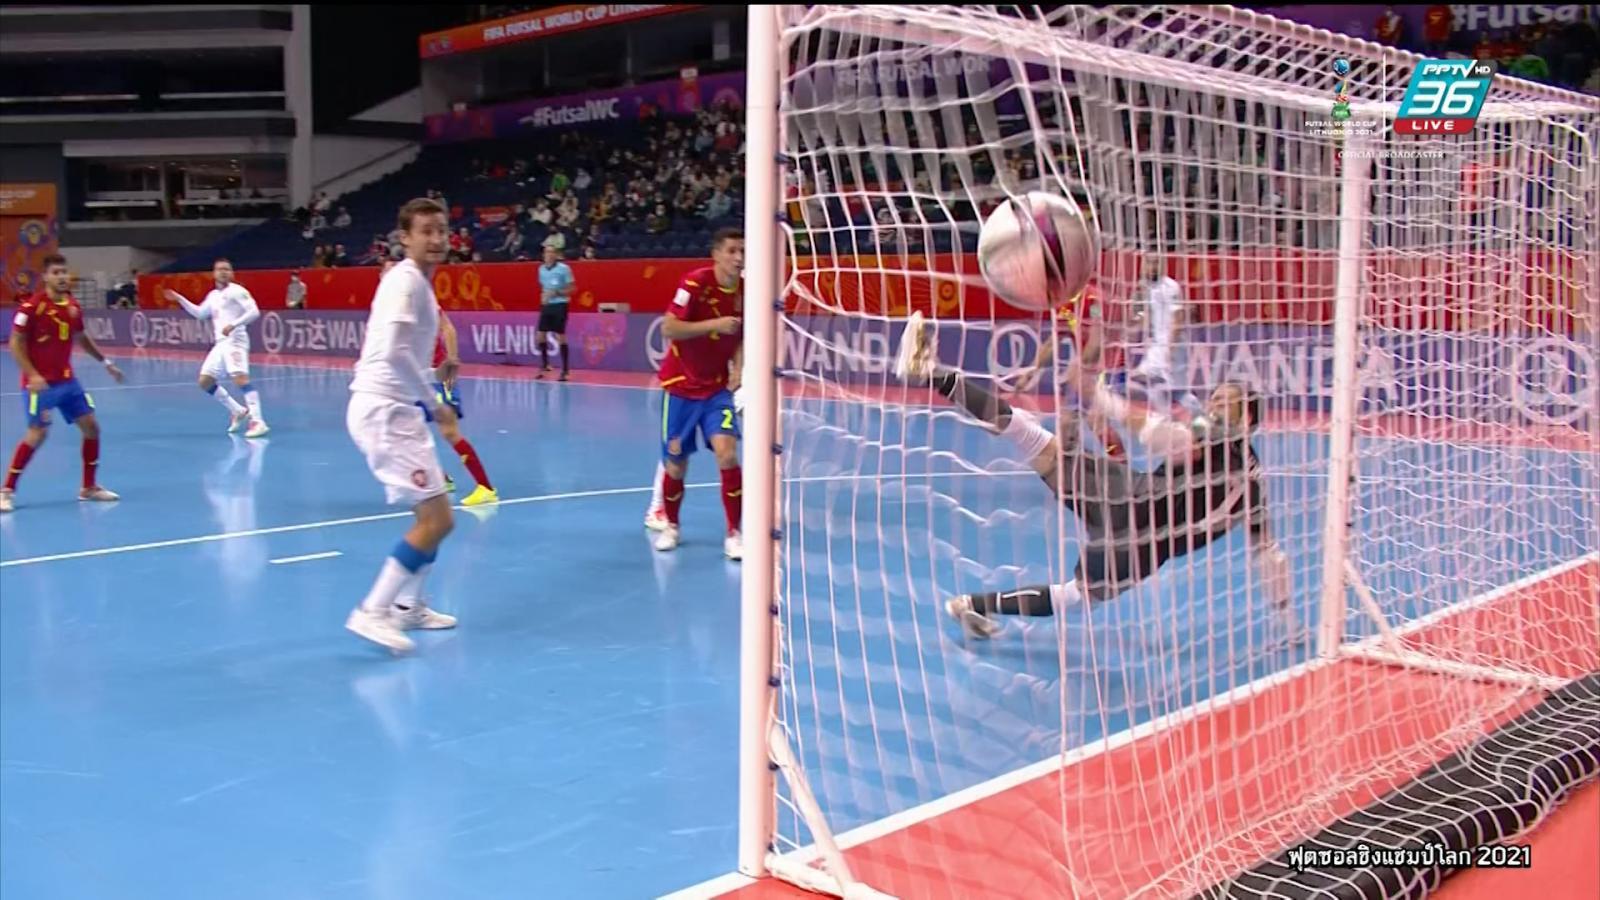 Full Match   ฟีฟ่า ฟุตซอล เวิลด์ คัพ 2021   สเปน 5-2 เช็ก   25 ก.ย. 64